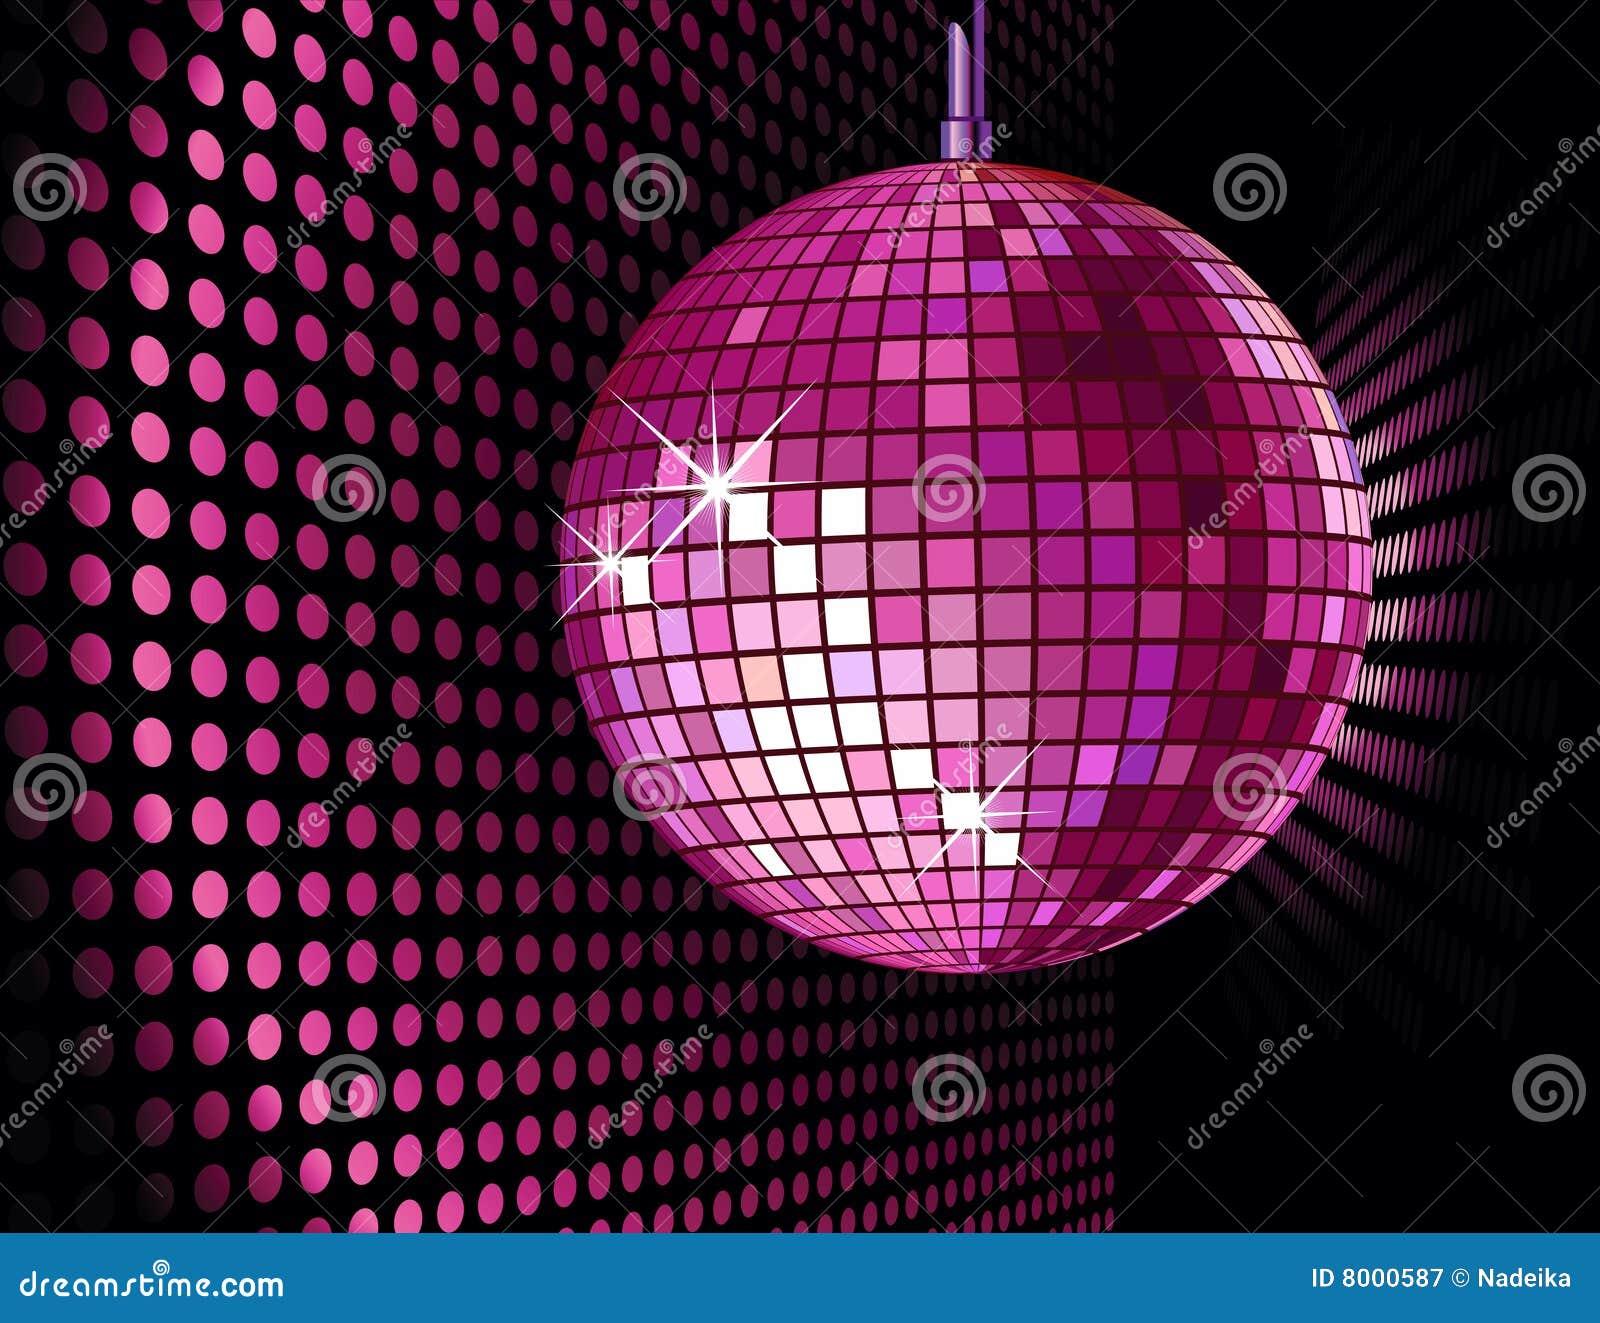 Bola del disco fotograf a de archivo libre de regal as - Bola de discoteca de colores ...